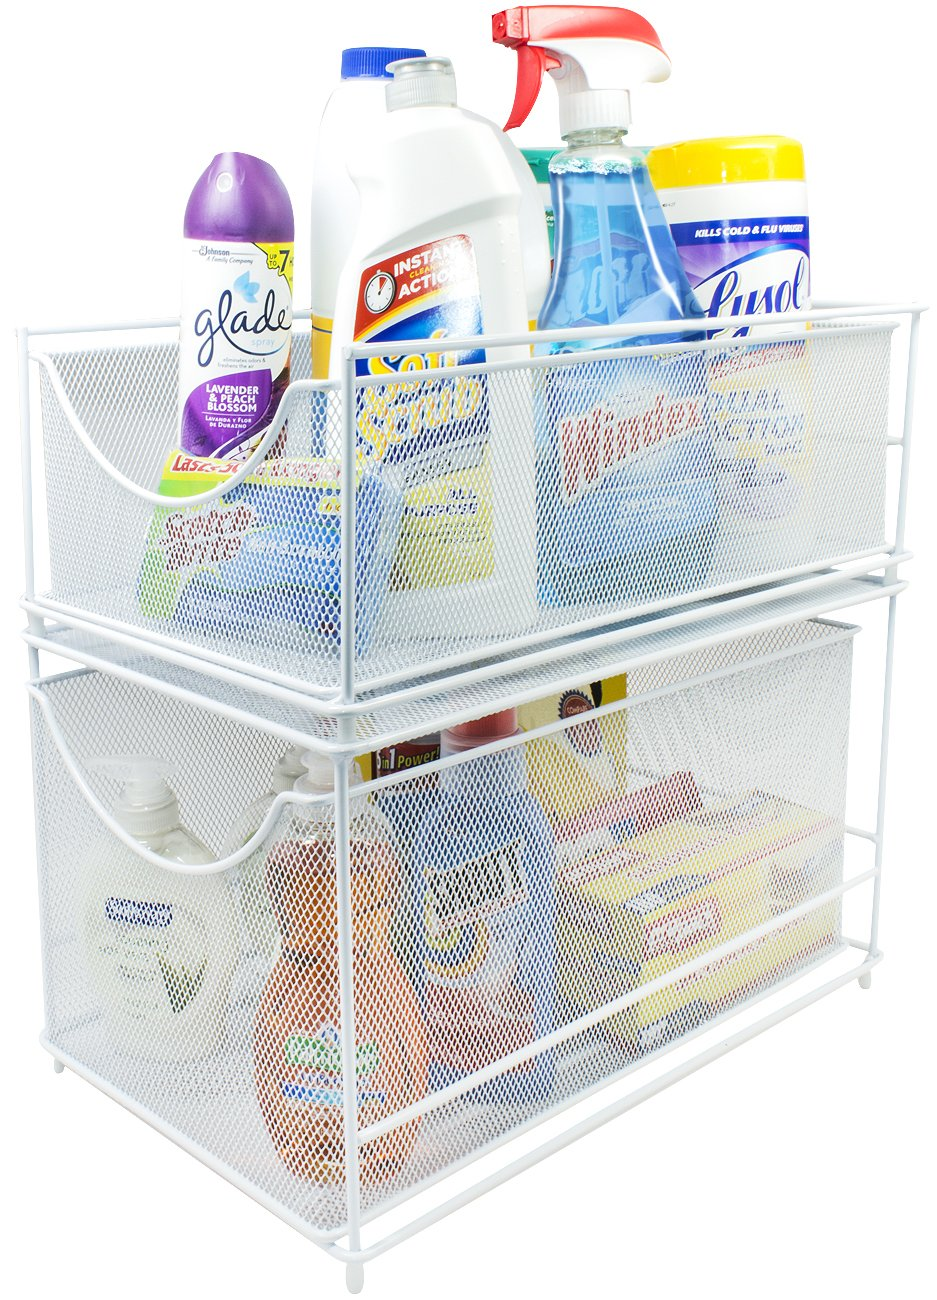 Sorbus Cabinet Organizer Set-Mesh Storage Organizer, White (2-Piece)